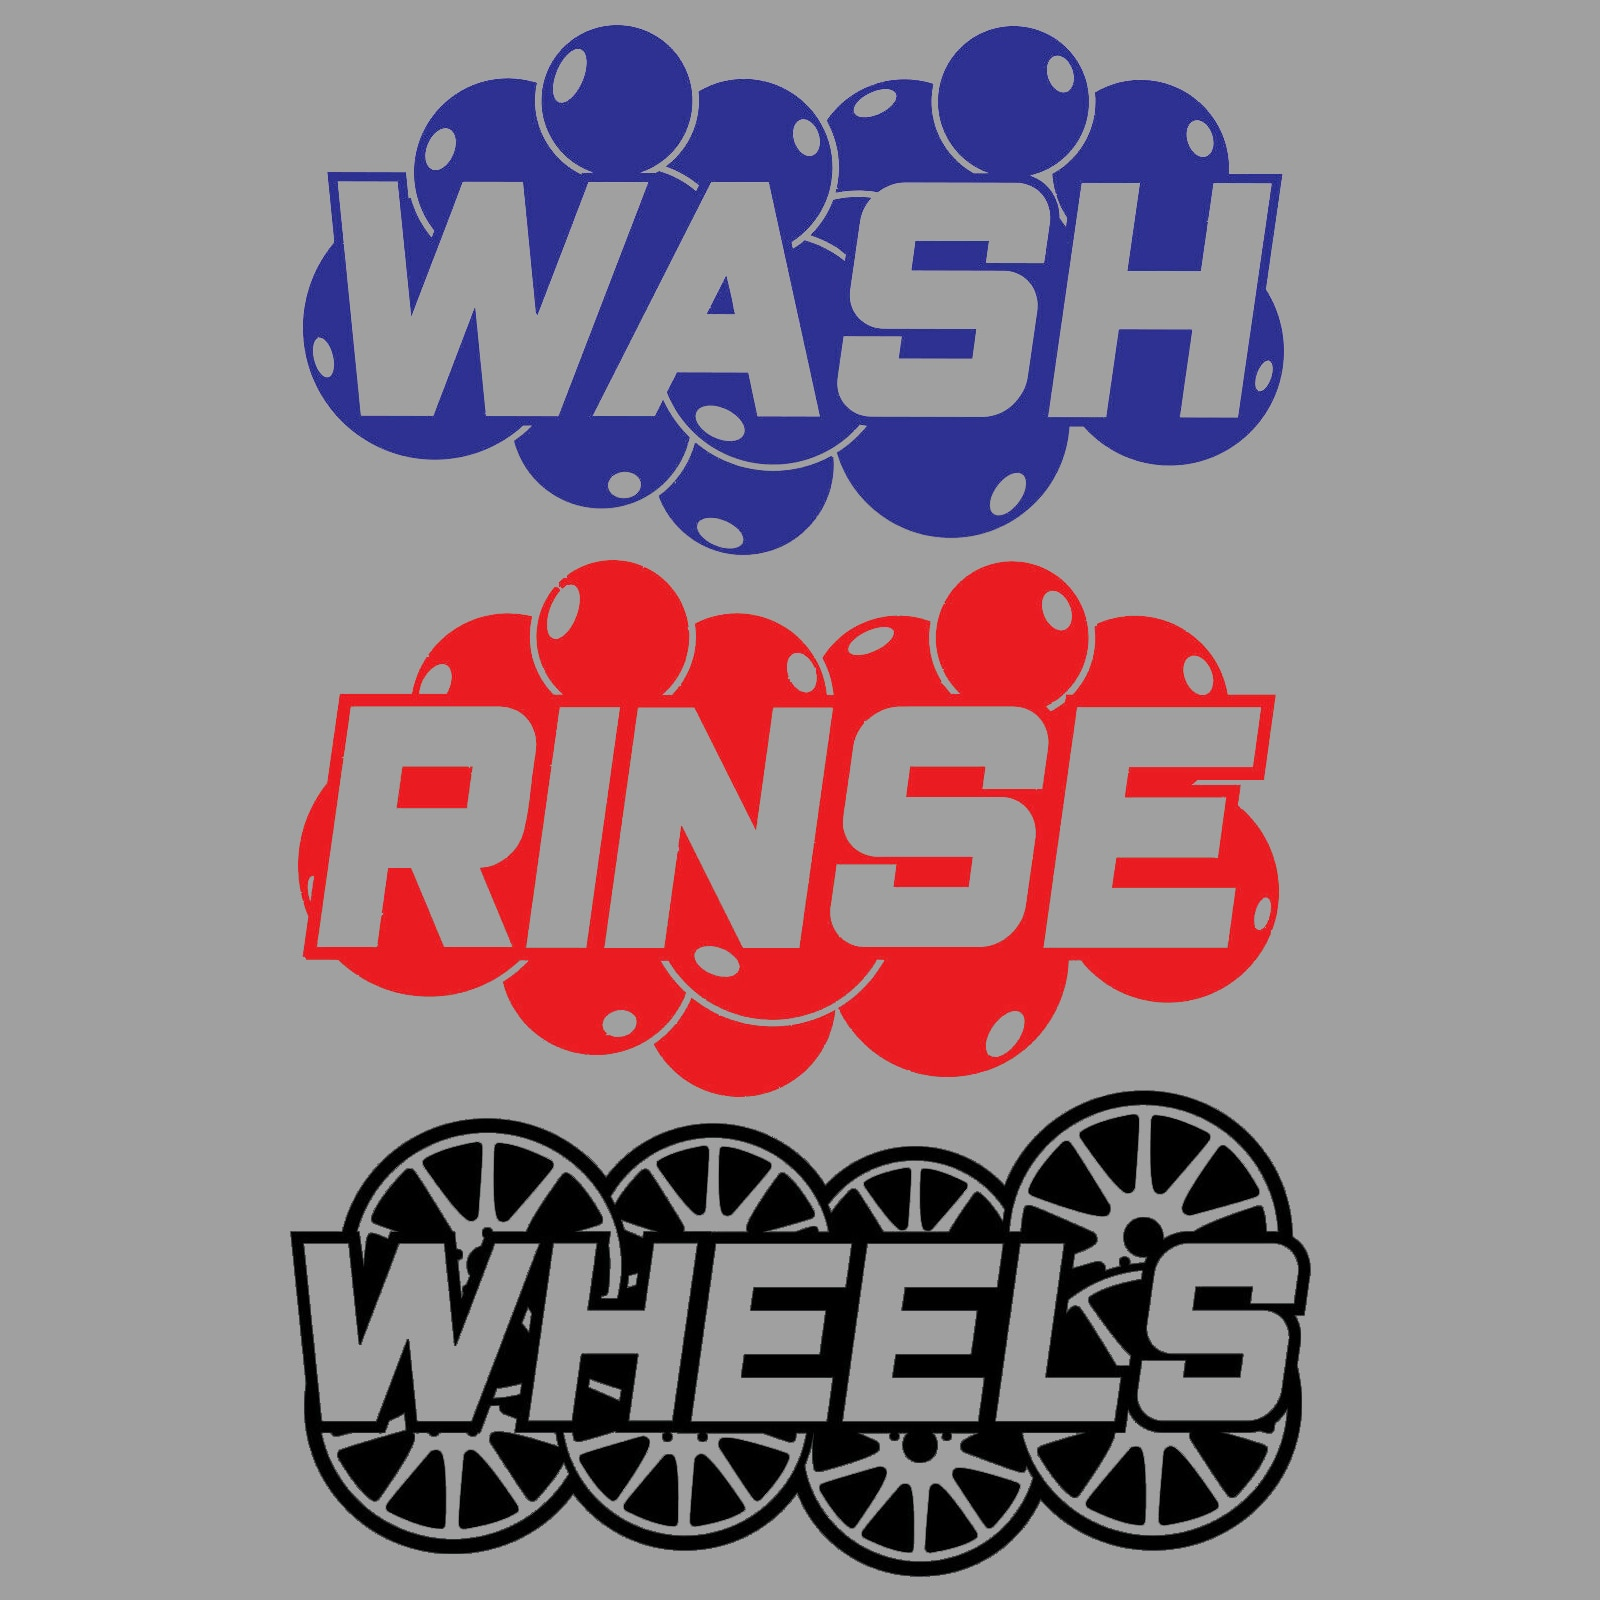 Wash, Rinse & Wheels Detailing & Valeting Vinyl Bucket Decal Stickers Car Wash